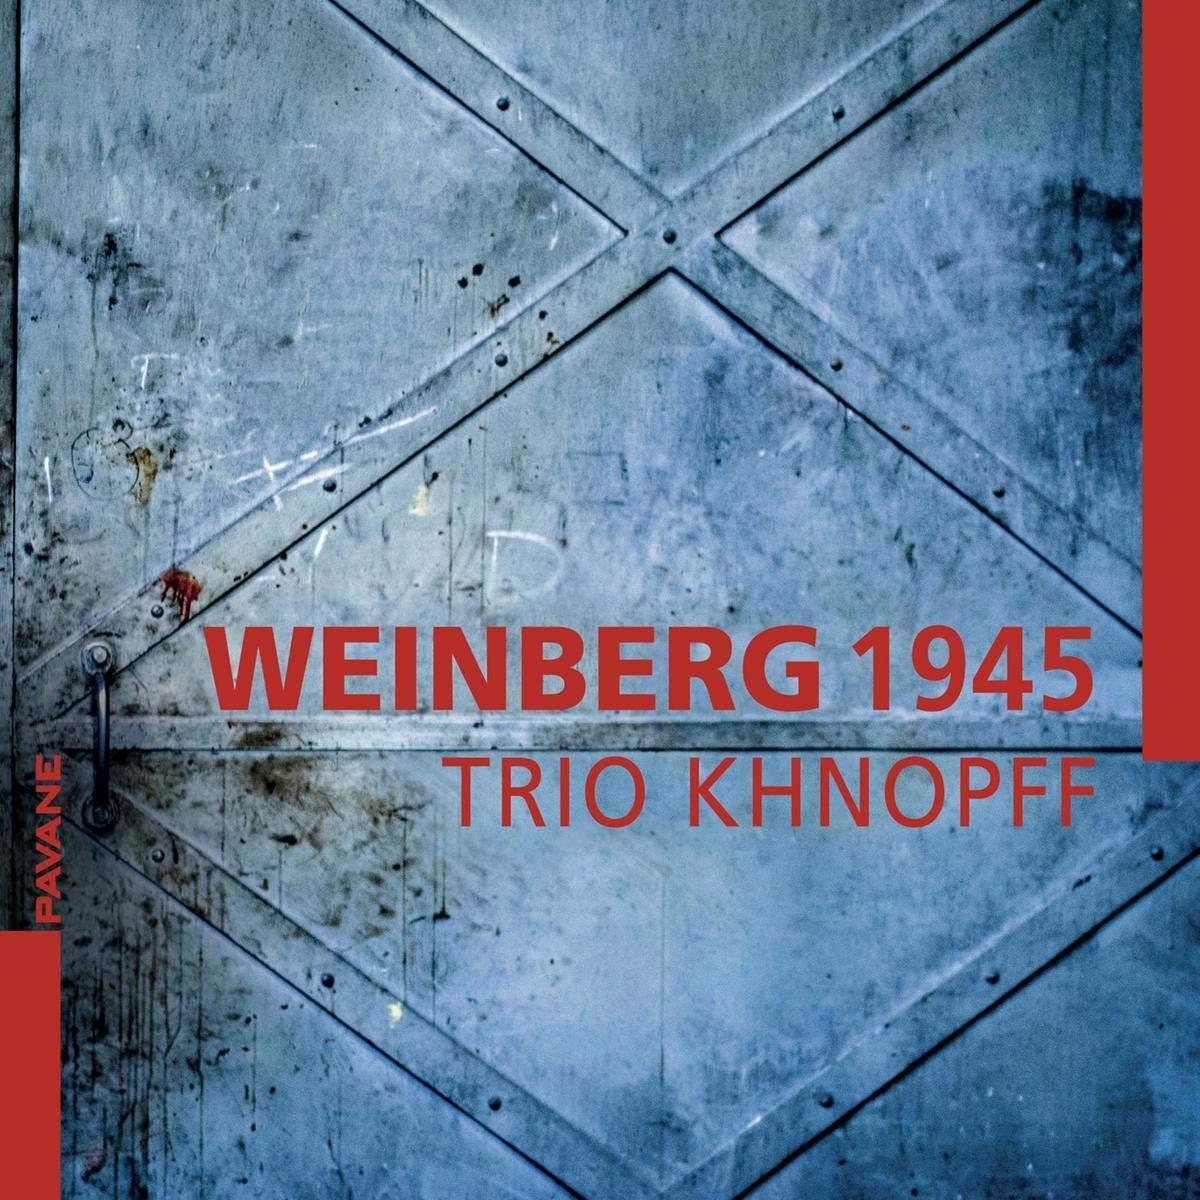 Weinberg 1945